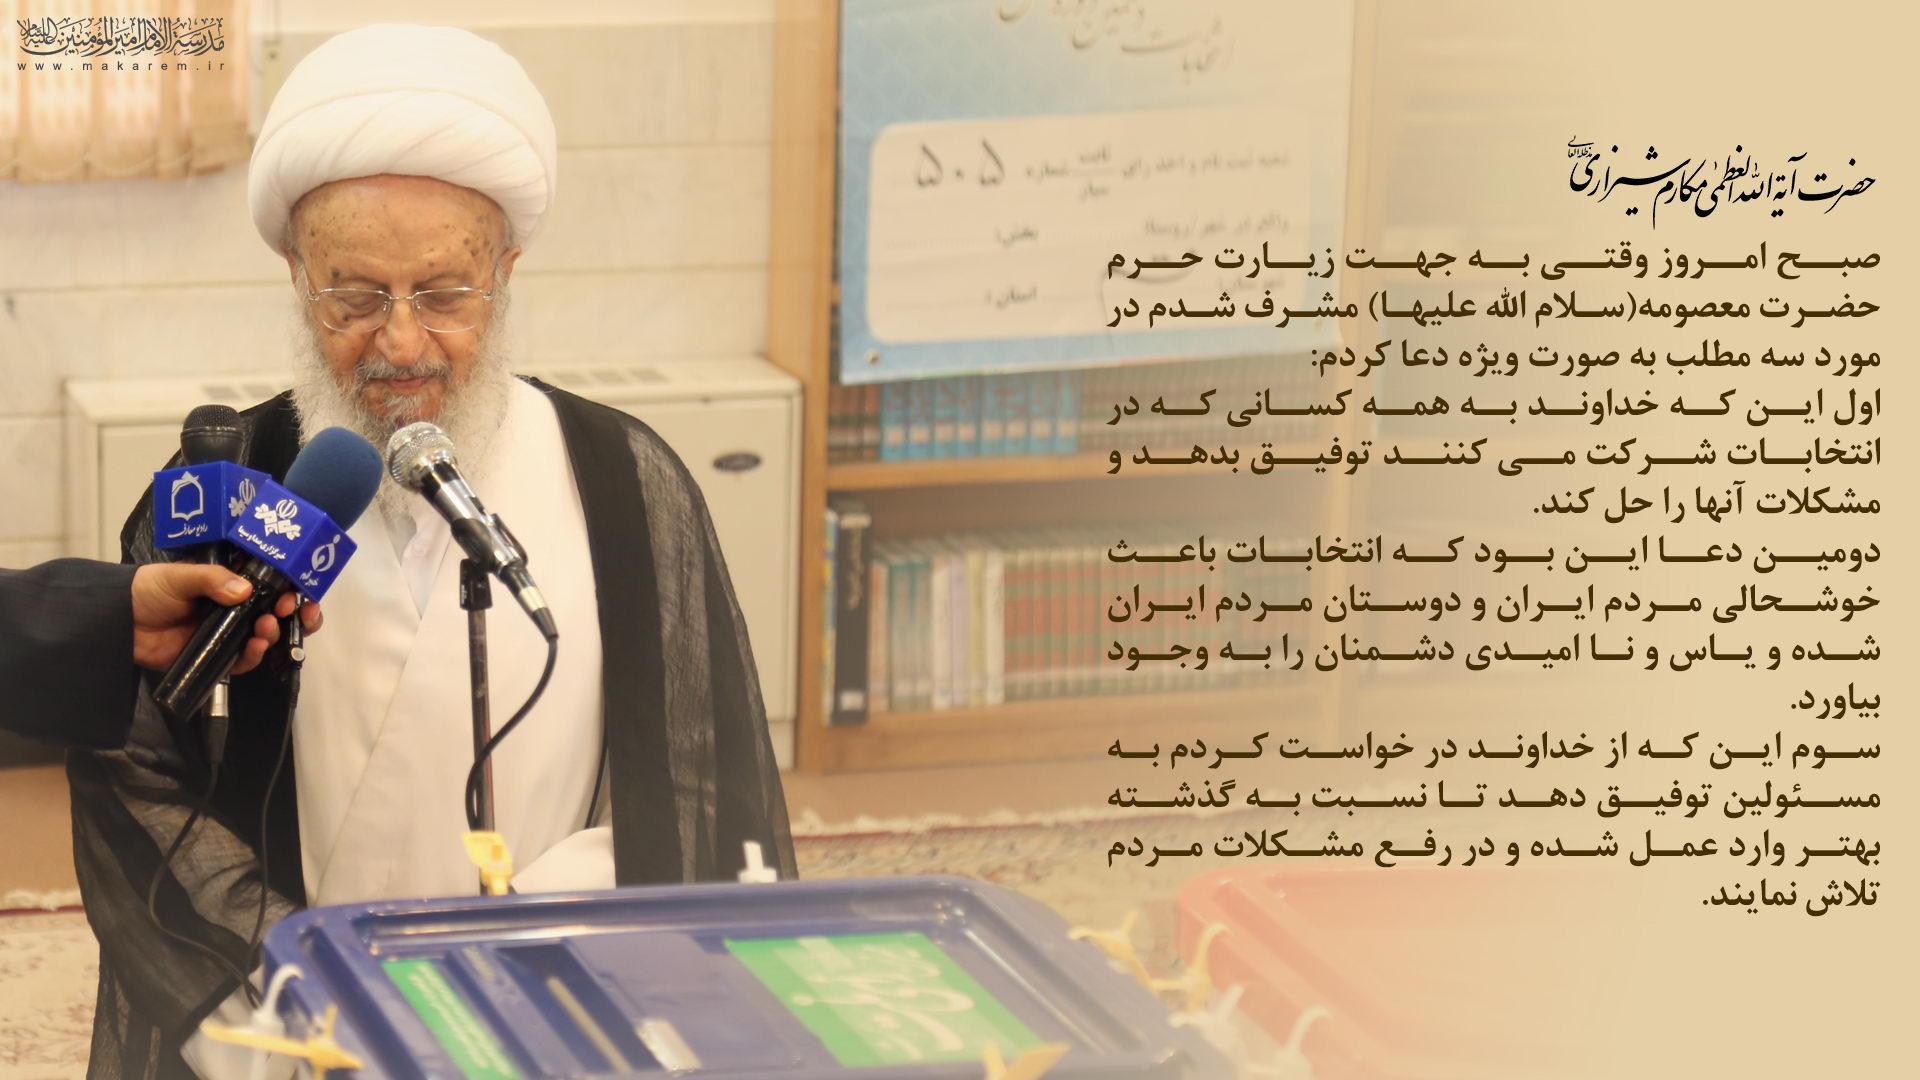 7 اسفند 01-مدرسه الامام امیر المومنین (ع)